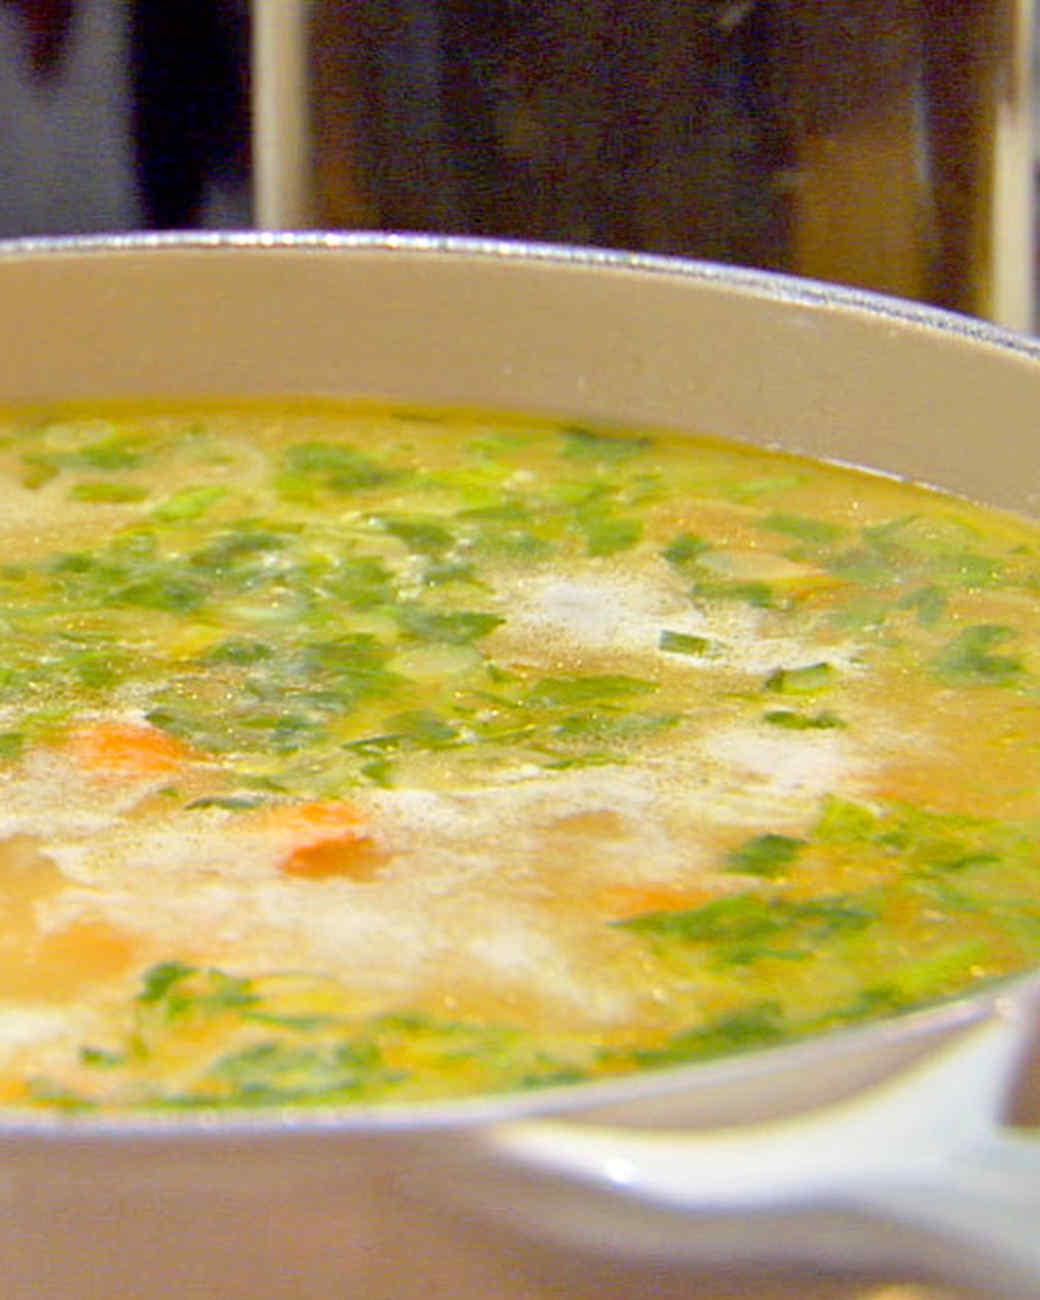 mh_1002_chick_soup.jpg